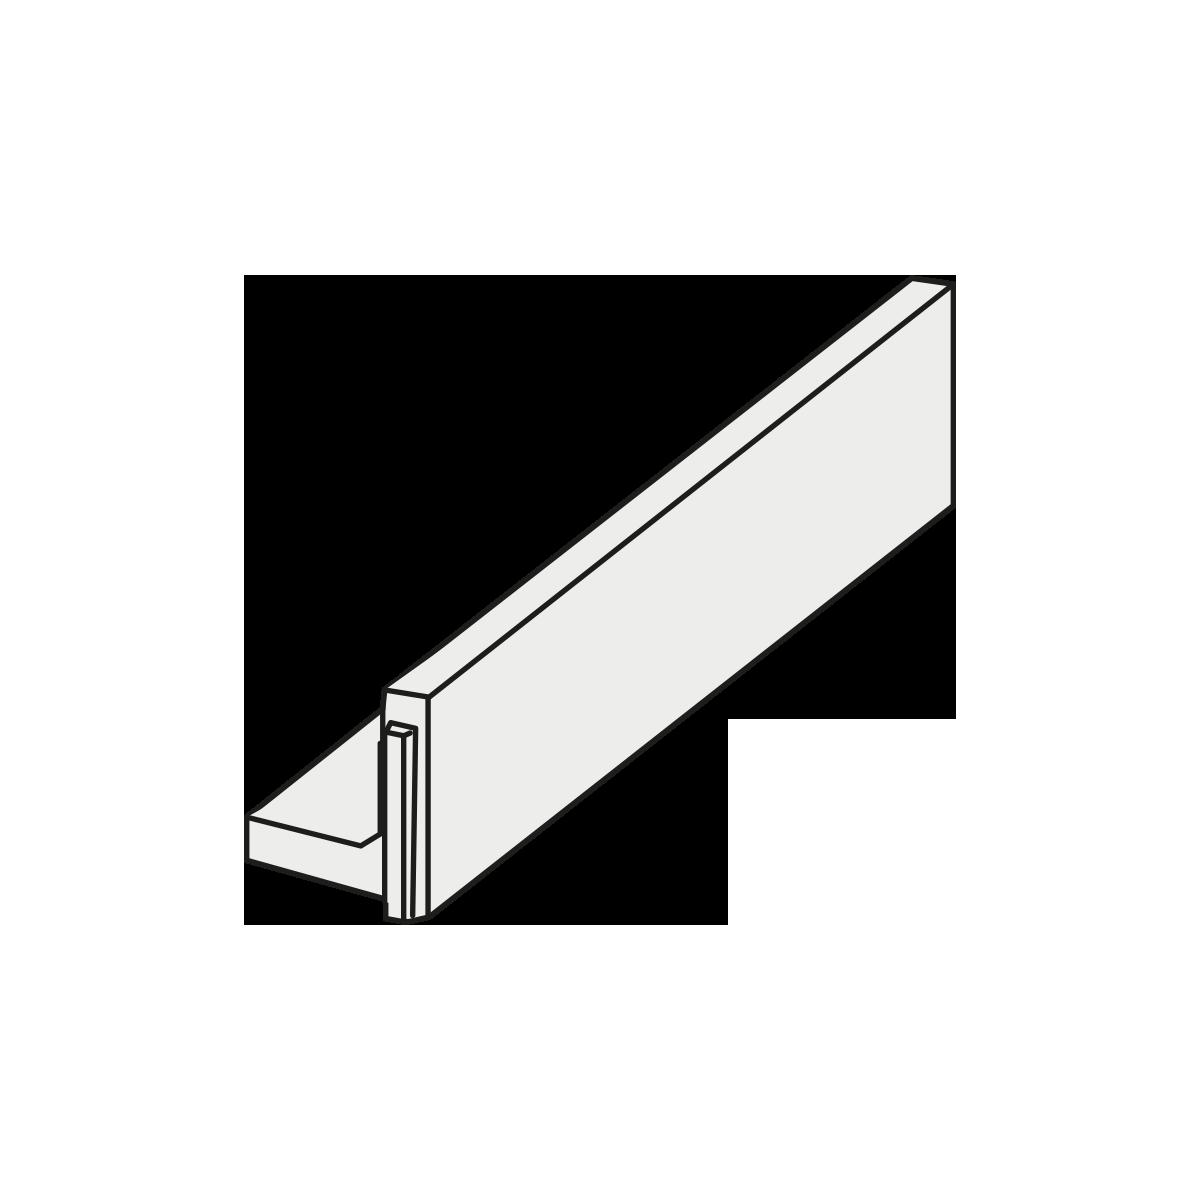 ParkLine Støttemur 160 - 95x120x10 cm Grå